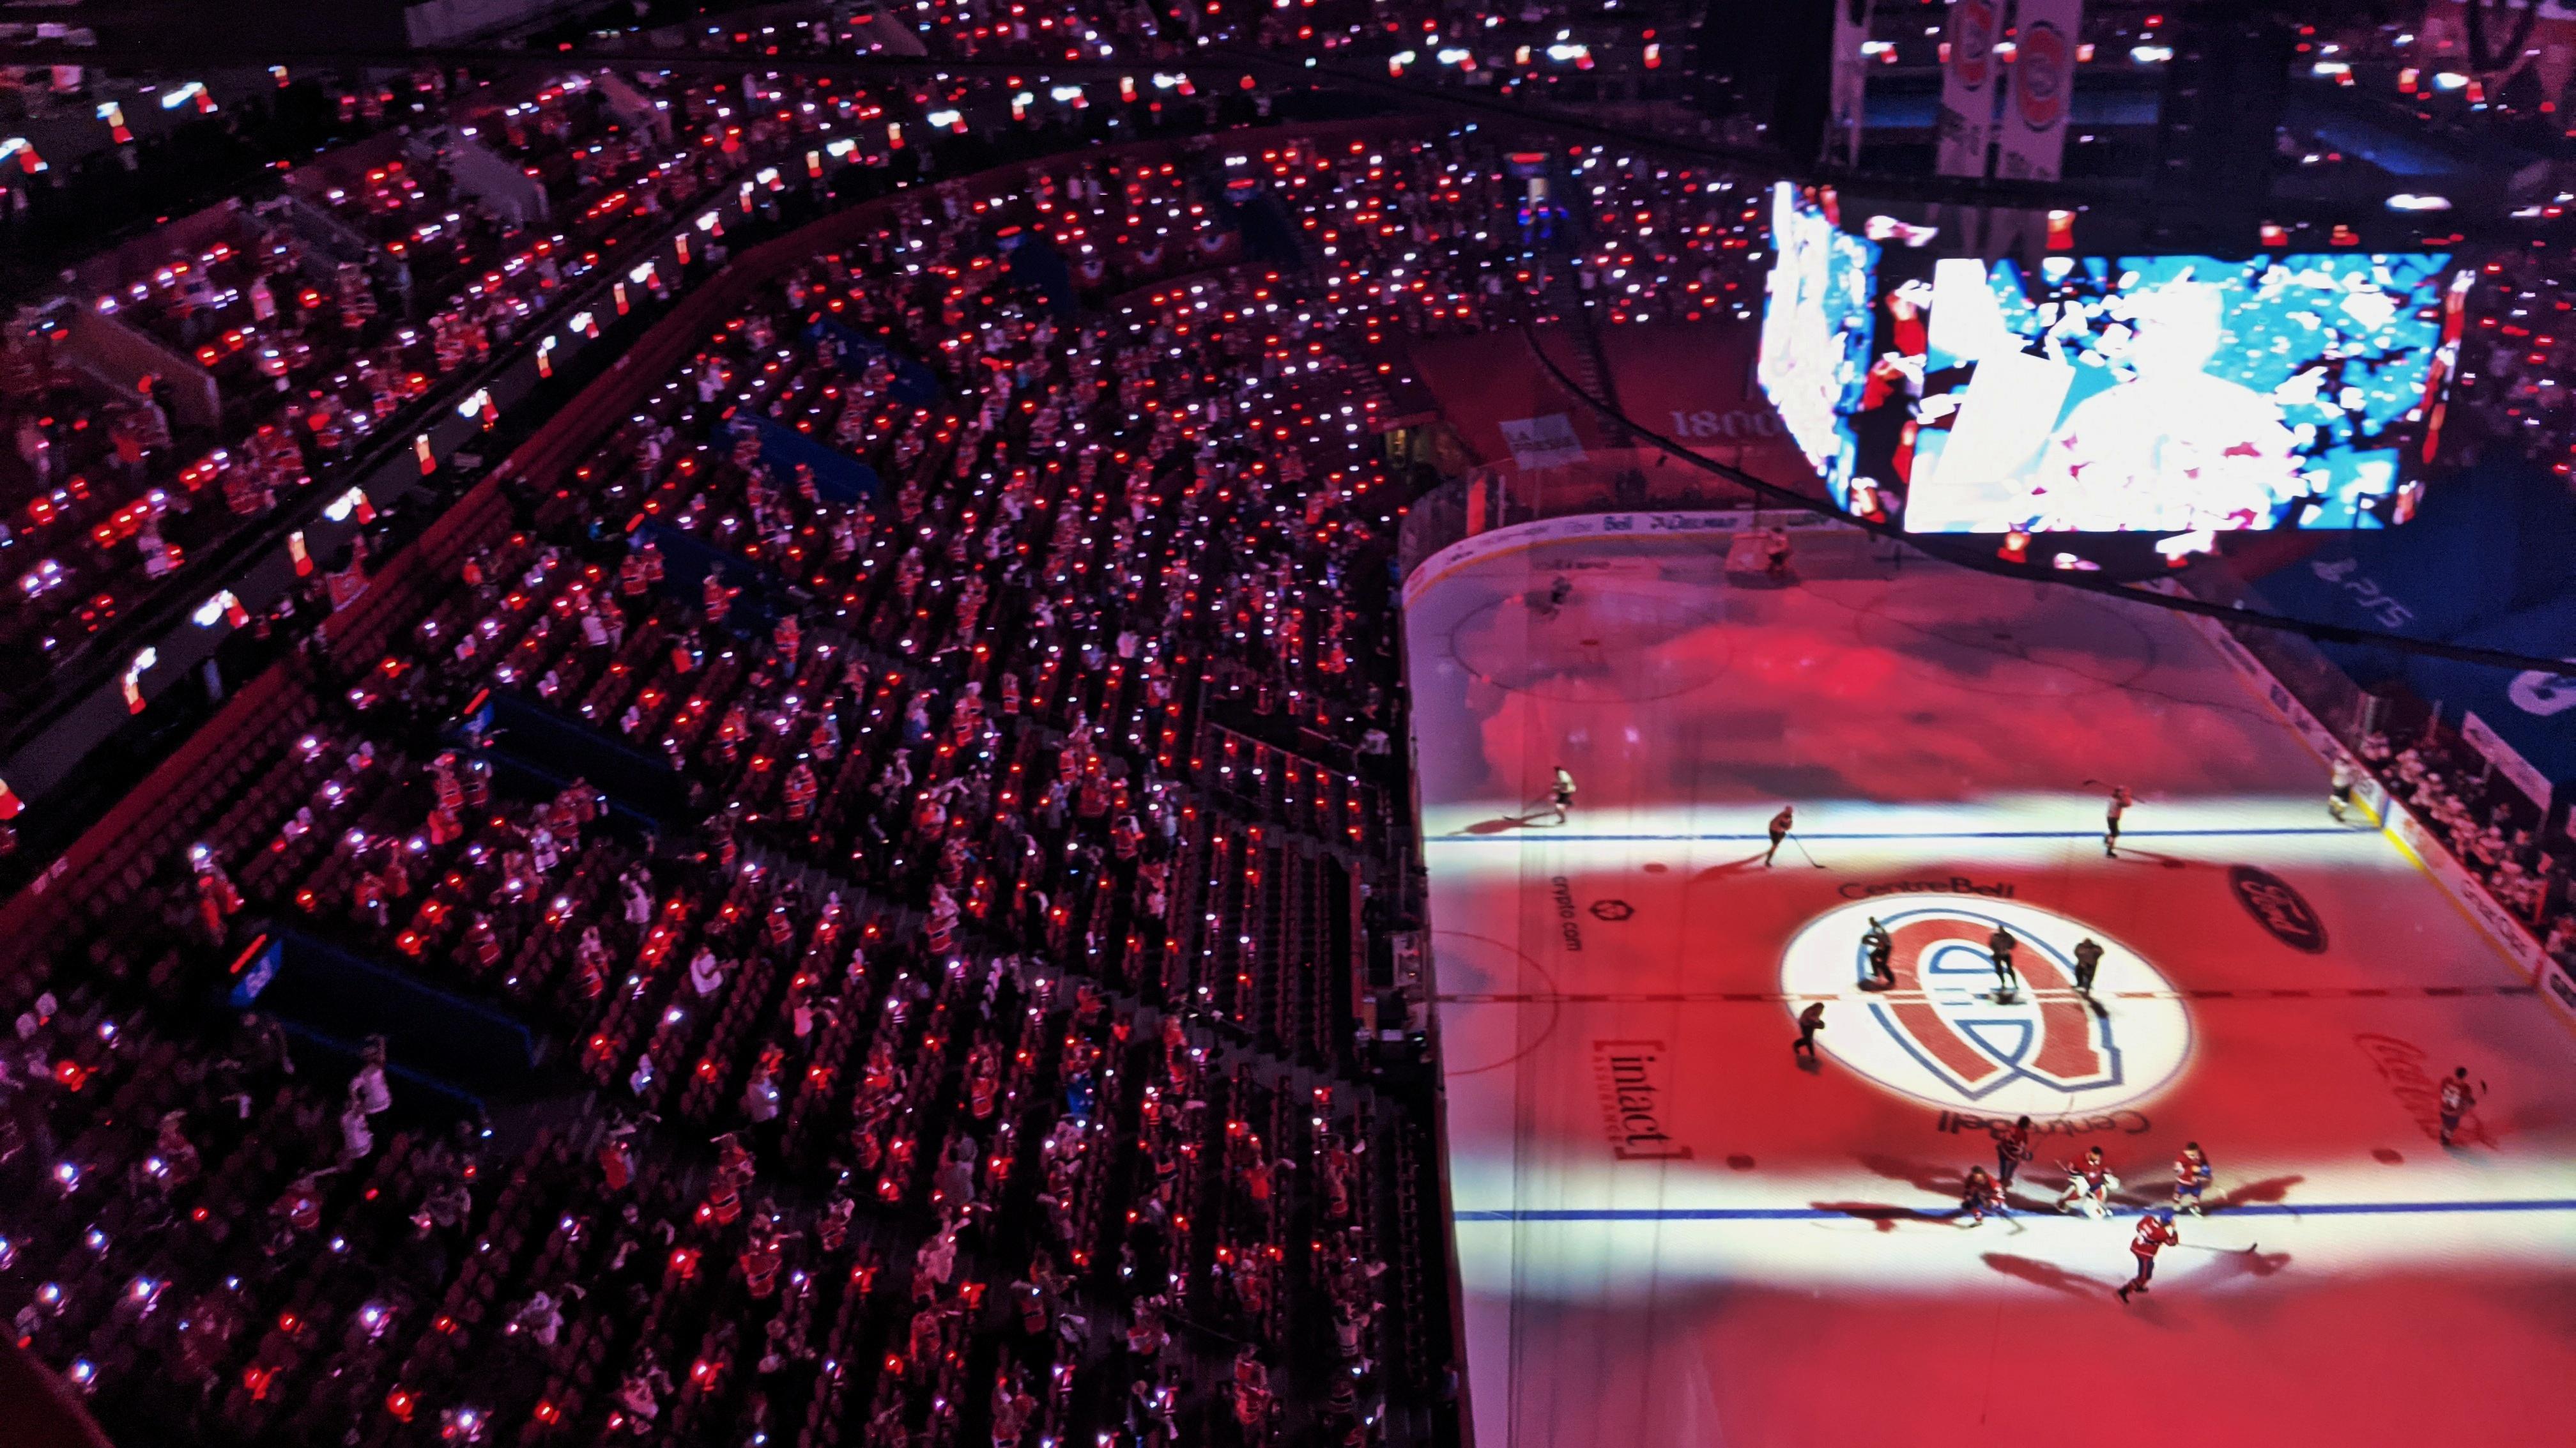 PixMob x Montreal Canadiens - Making 3,500 Feel Like 35,000